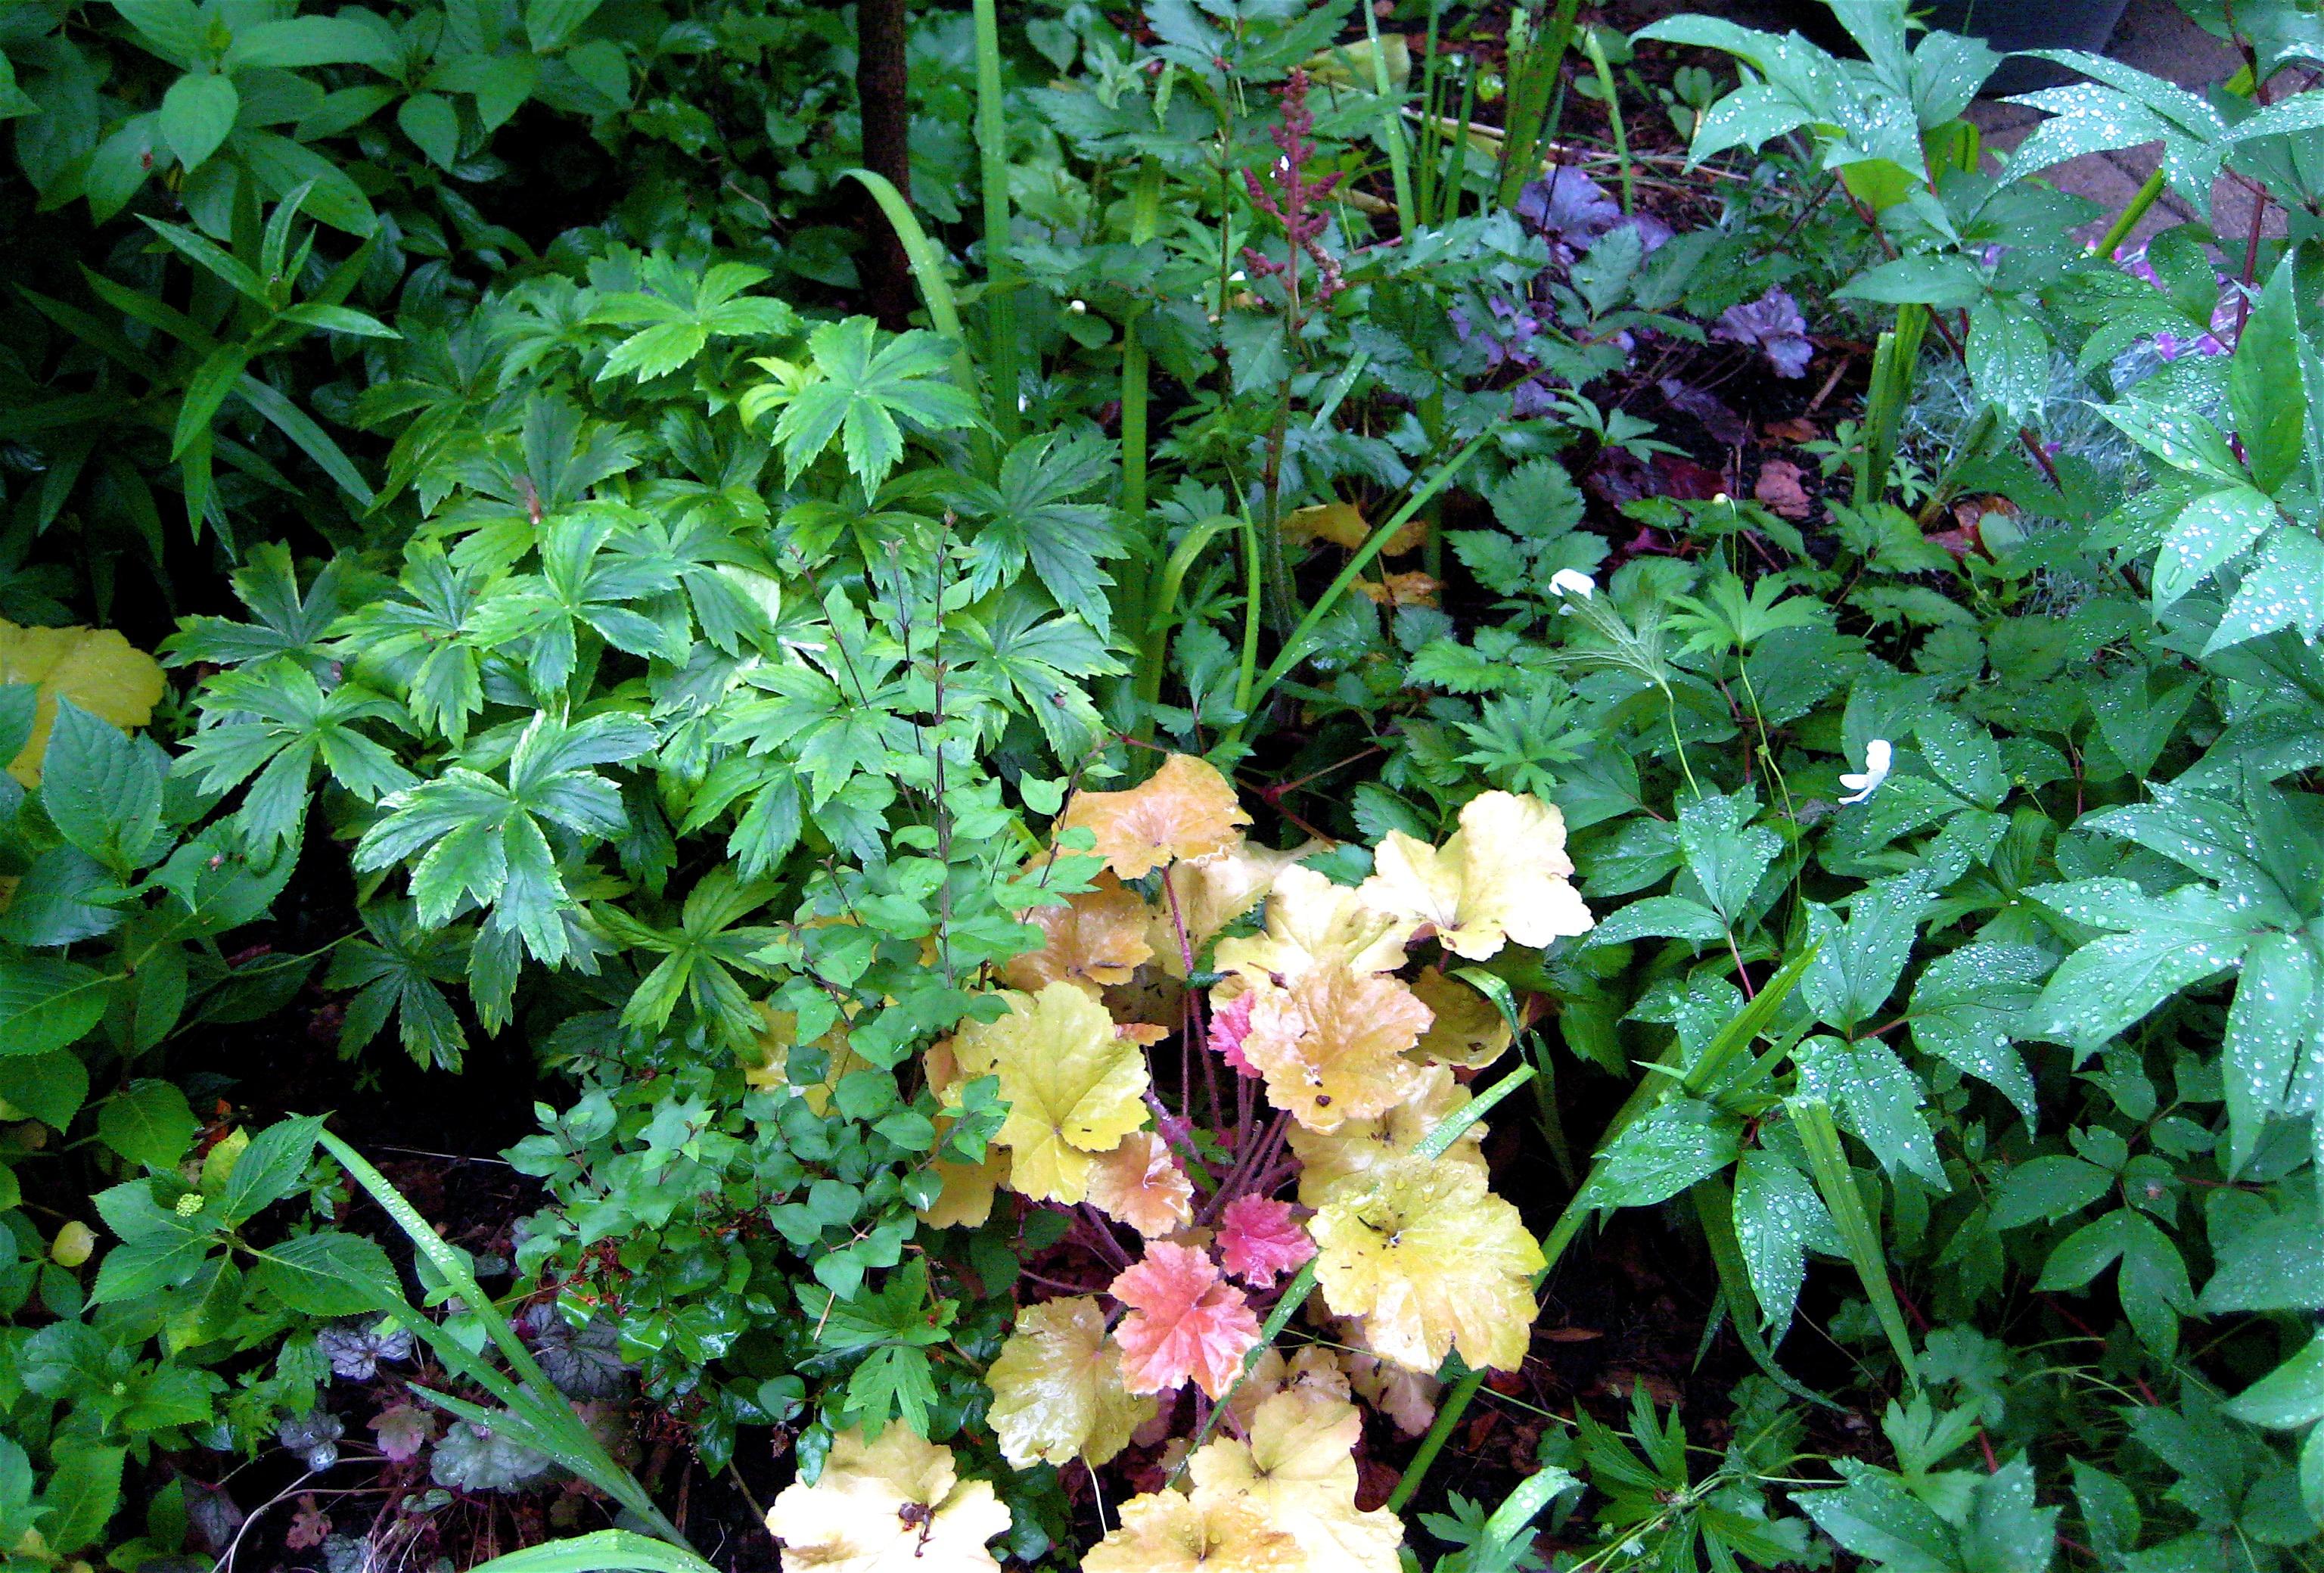 Aldona Satterthwaite Gardening From A Hammock